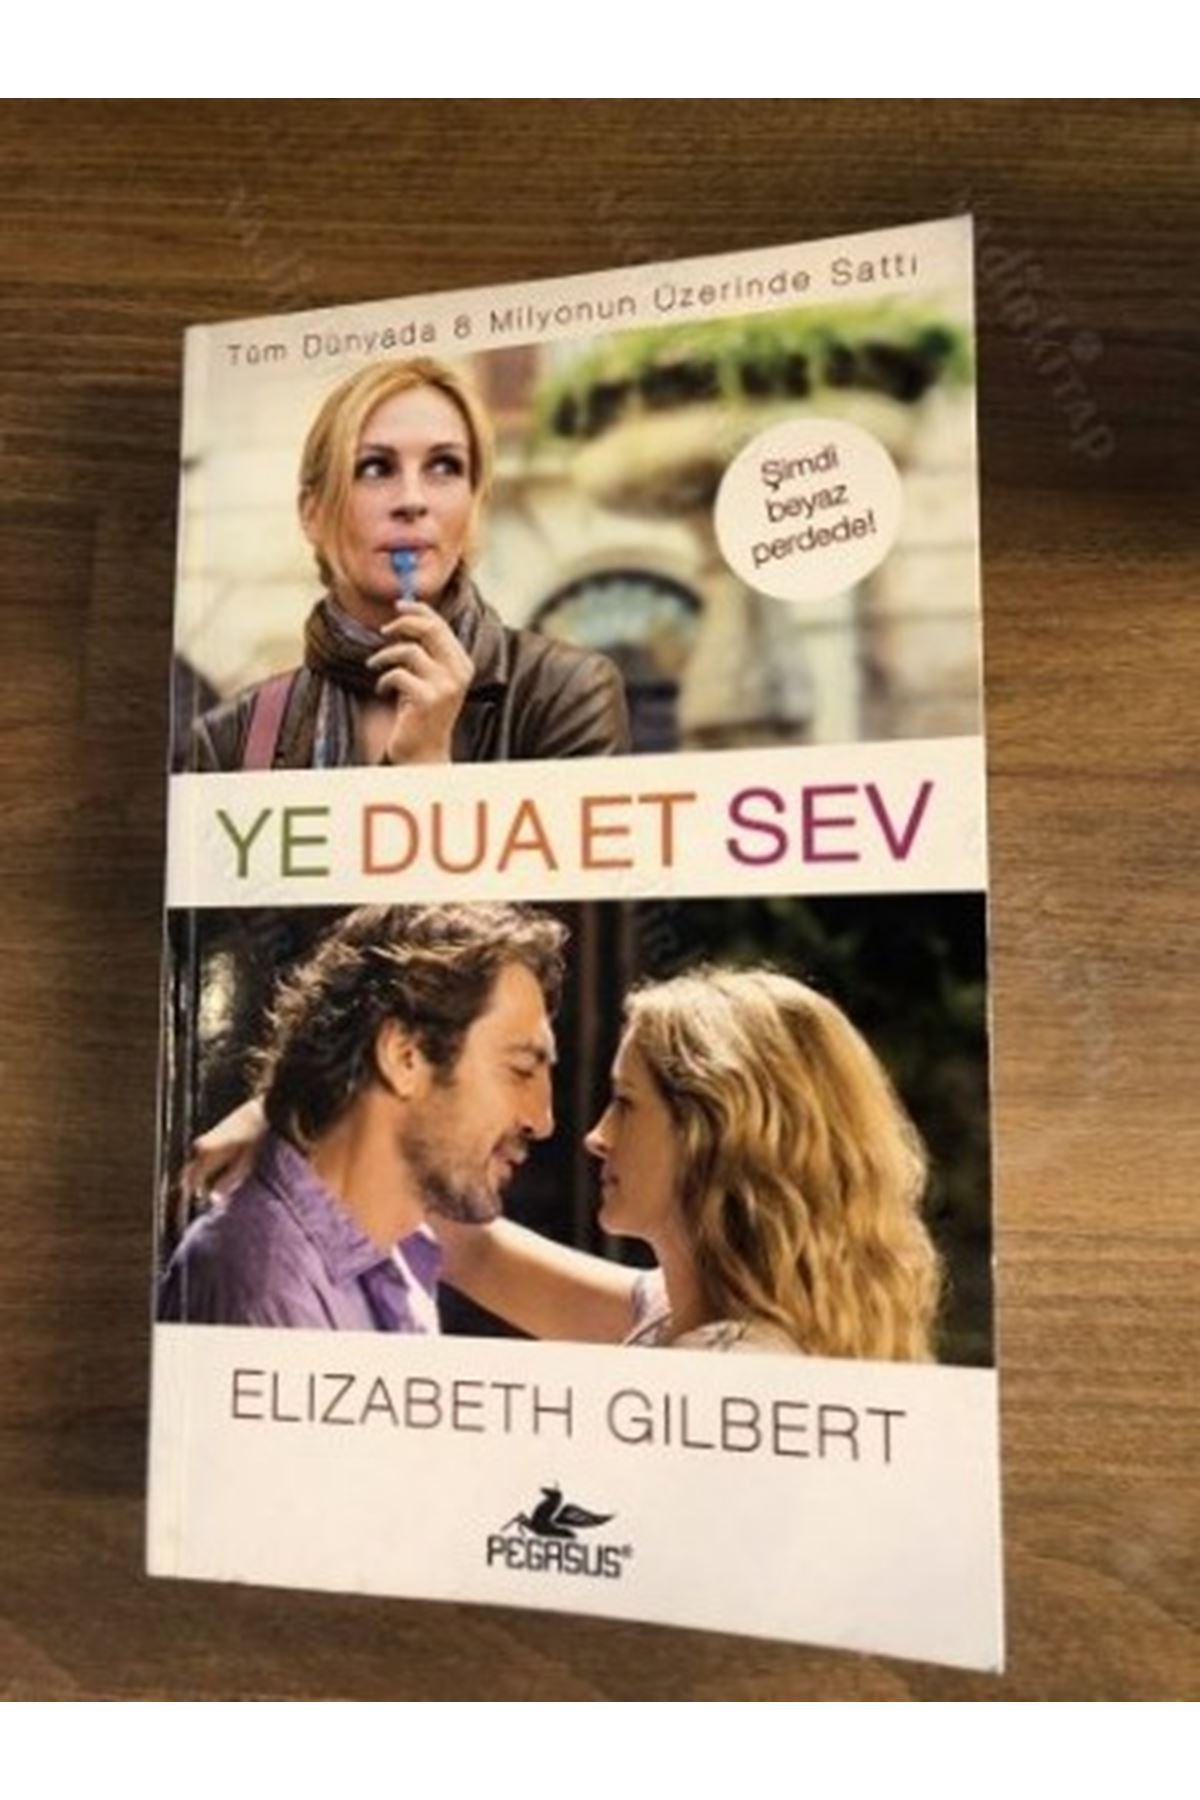 ELIZABETH GILBERT - YE DUA ET SEV